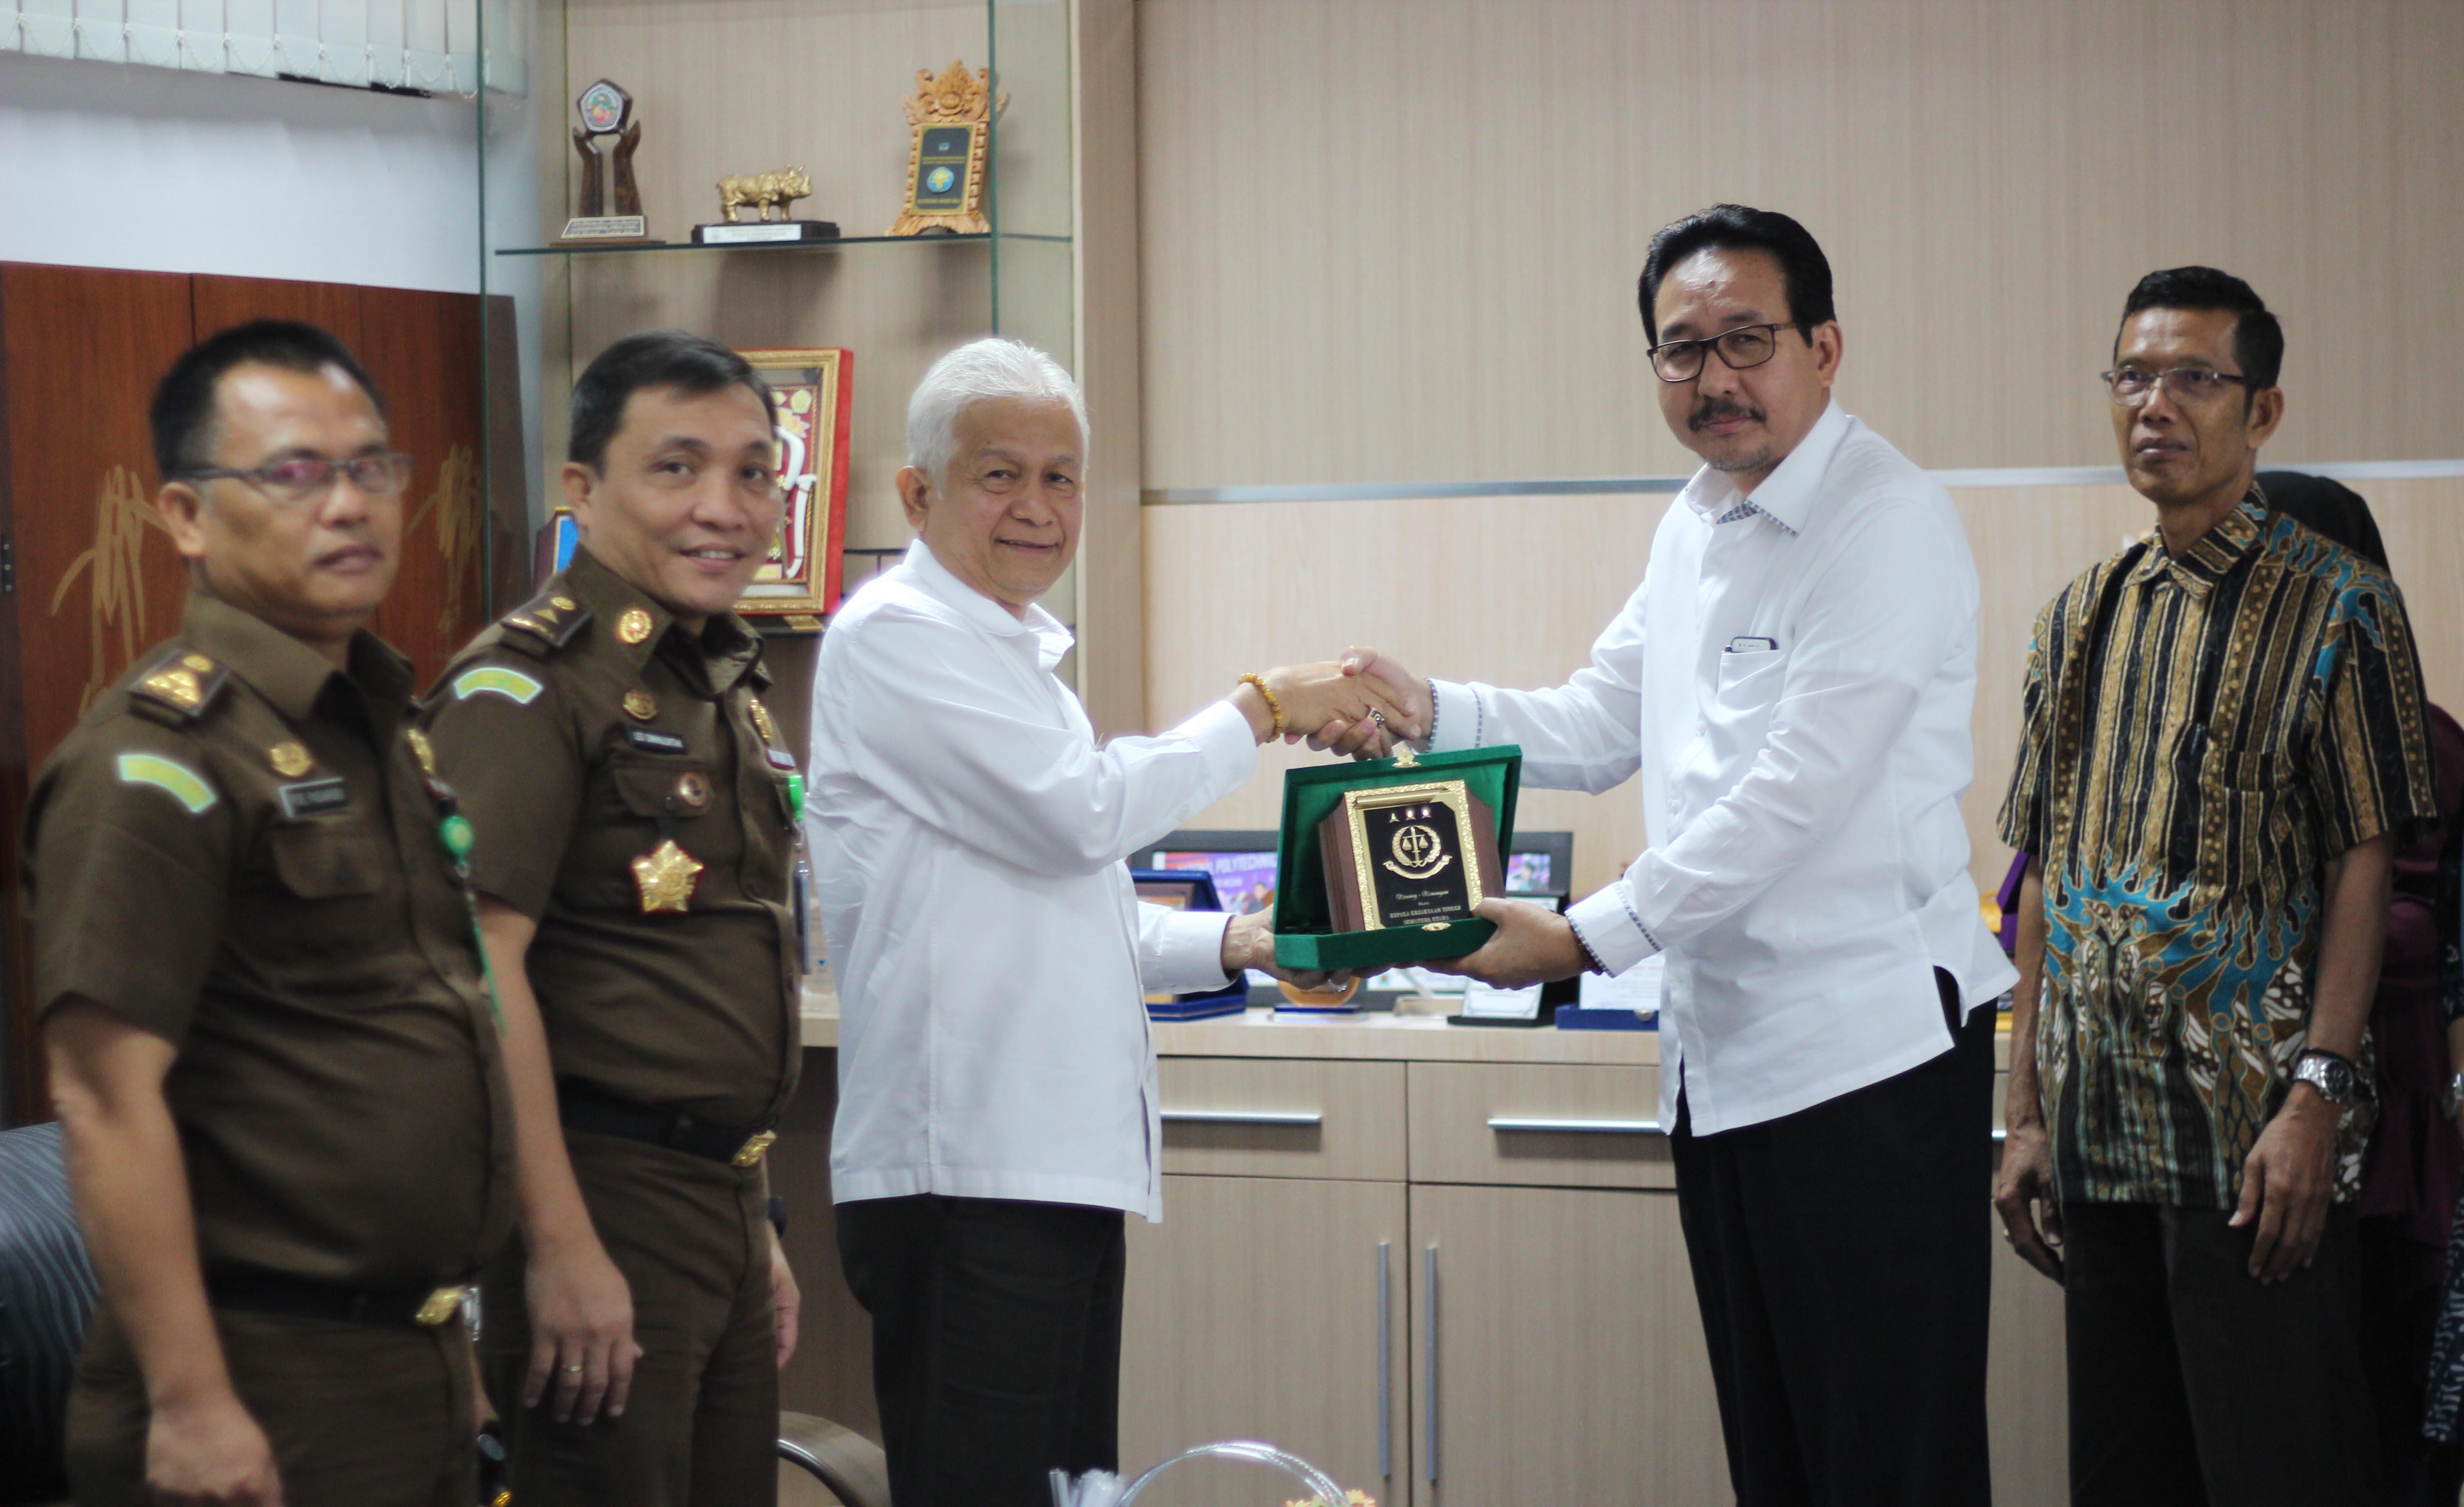 Politeknik Negeri Medan Menerima Kunjungan Dari Kejaksaan Tinggi Sumatera Utara